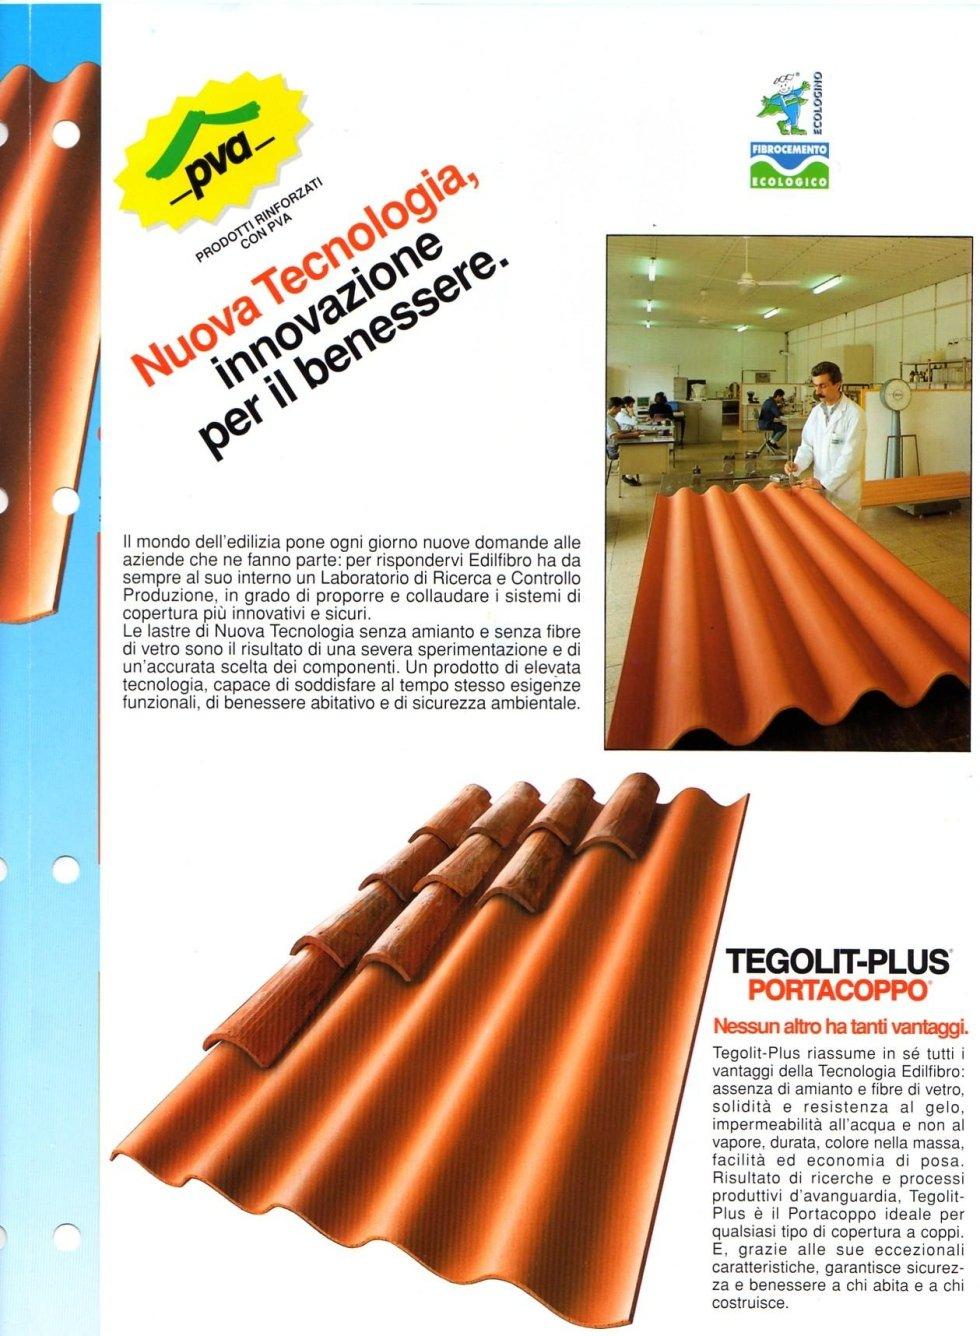 Tegolit Plus